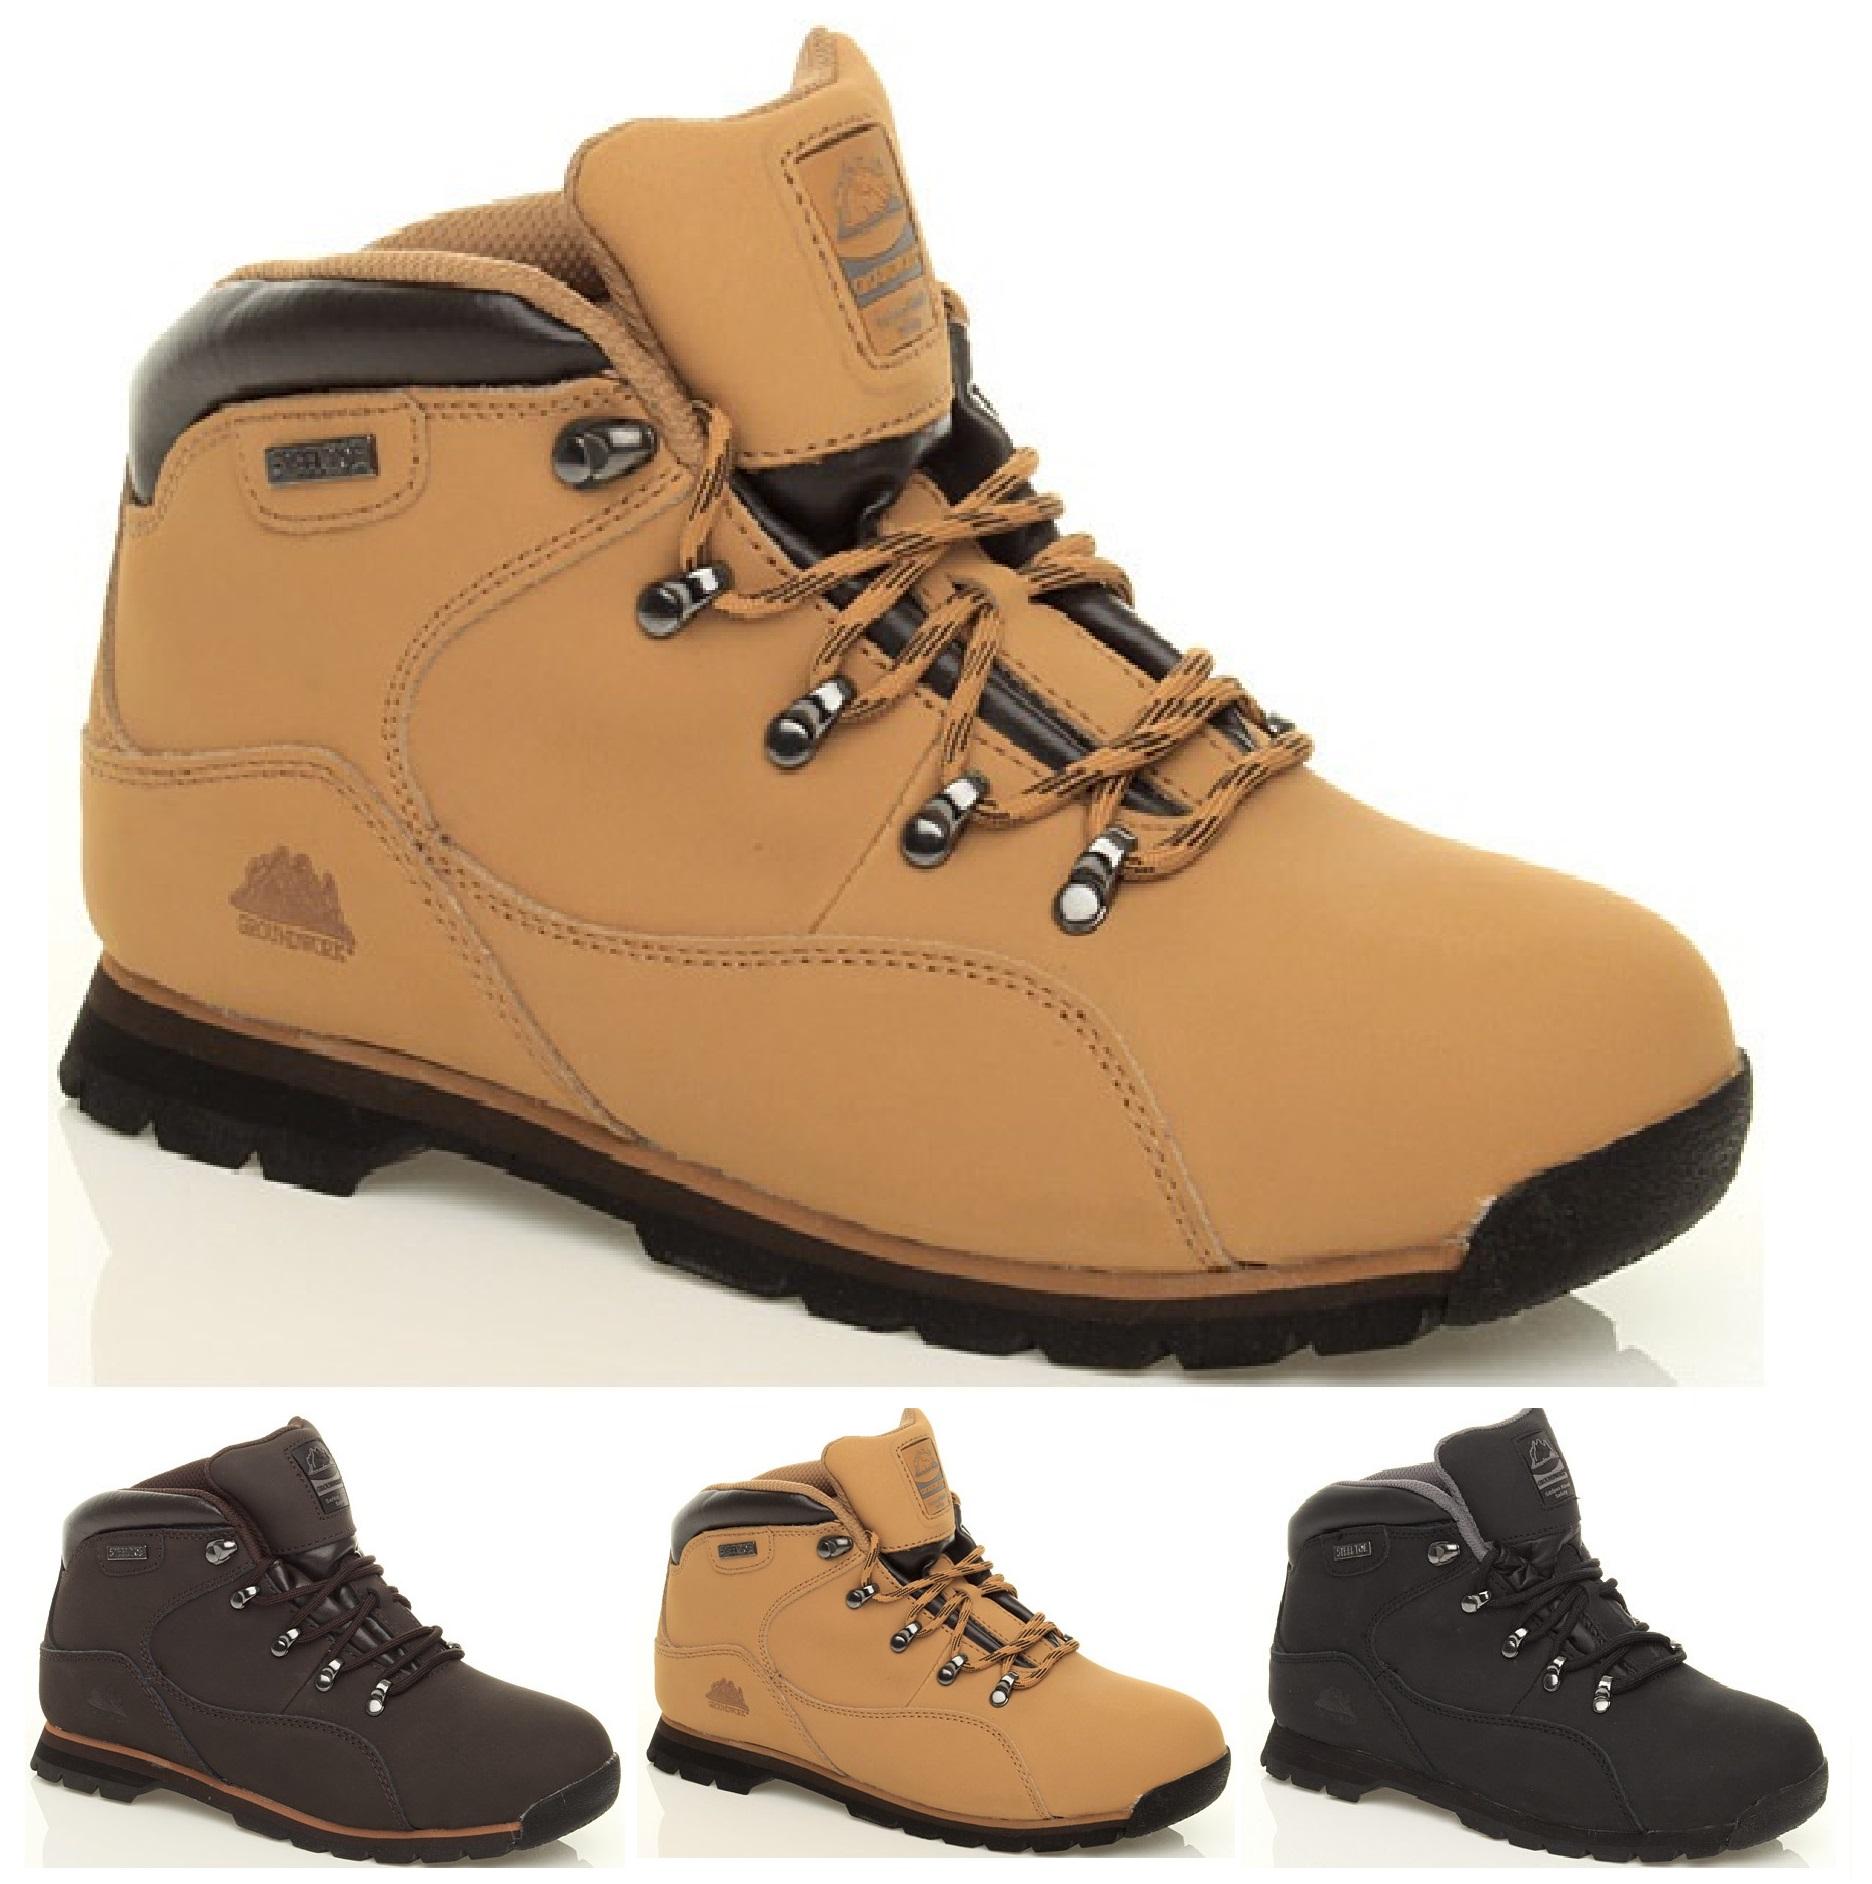 mens safety trainer boots work steel toe cap ankle boot. Black Bedroom Furniture Sets. Home Design Ideas